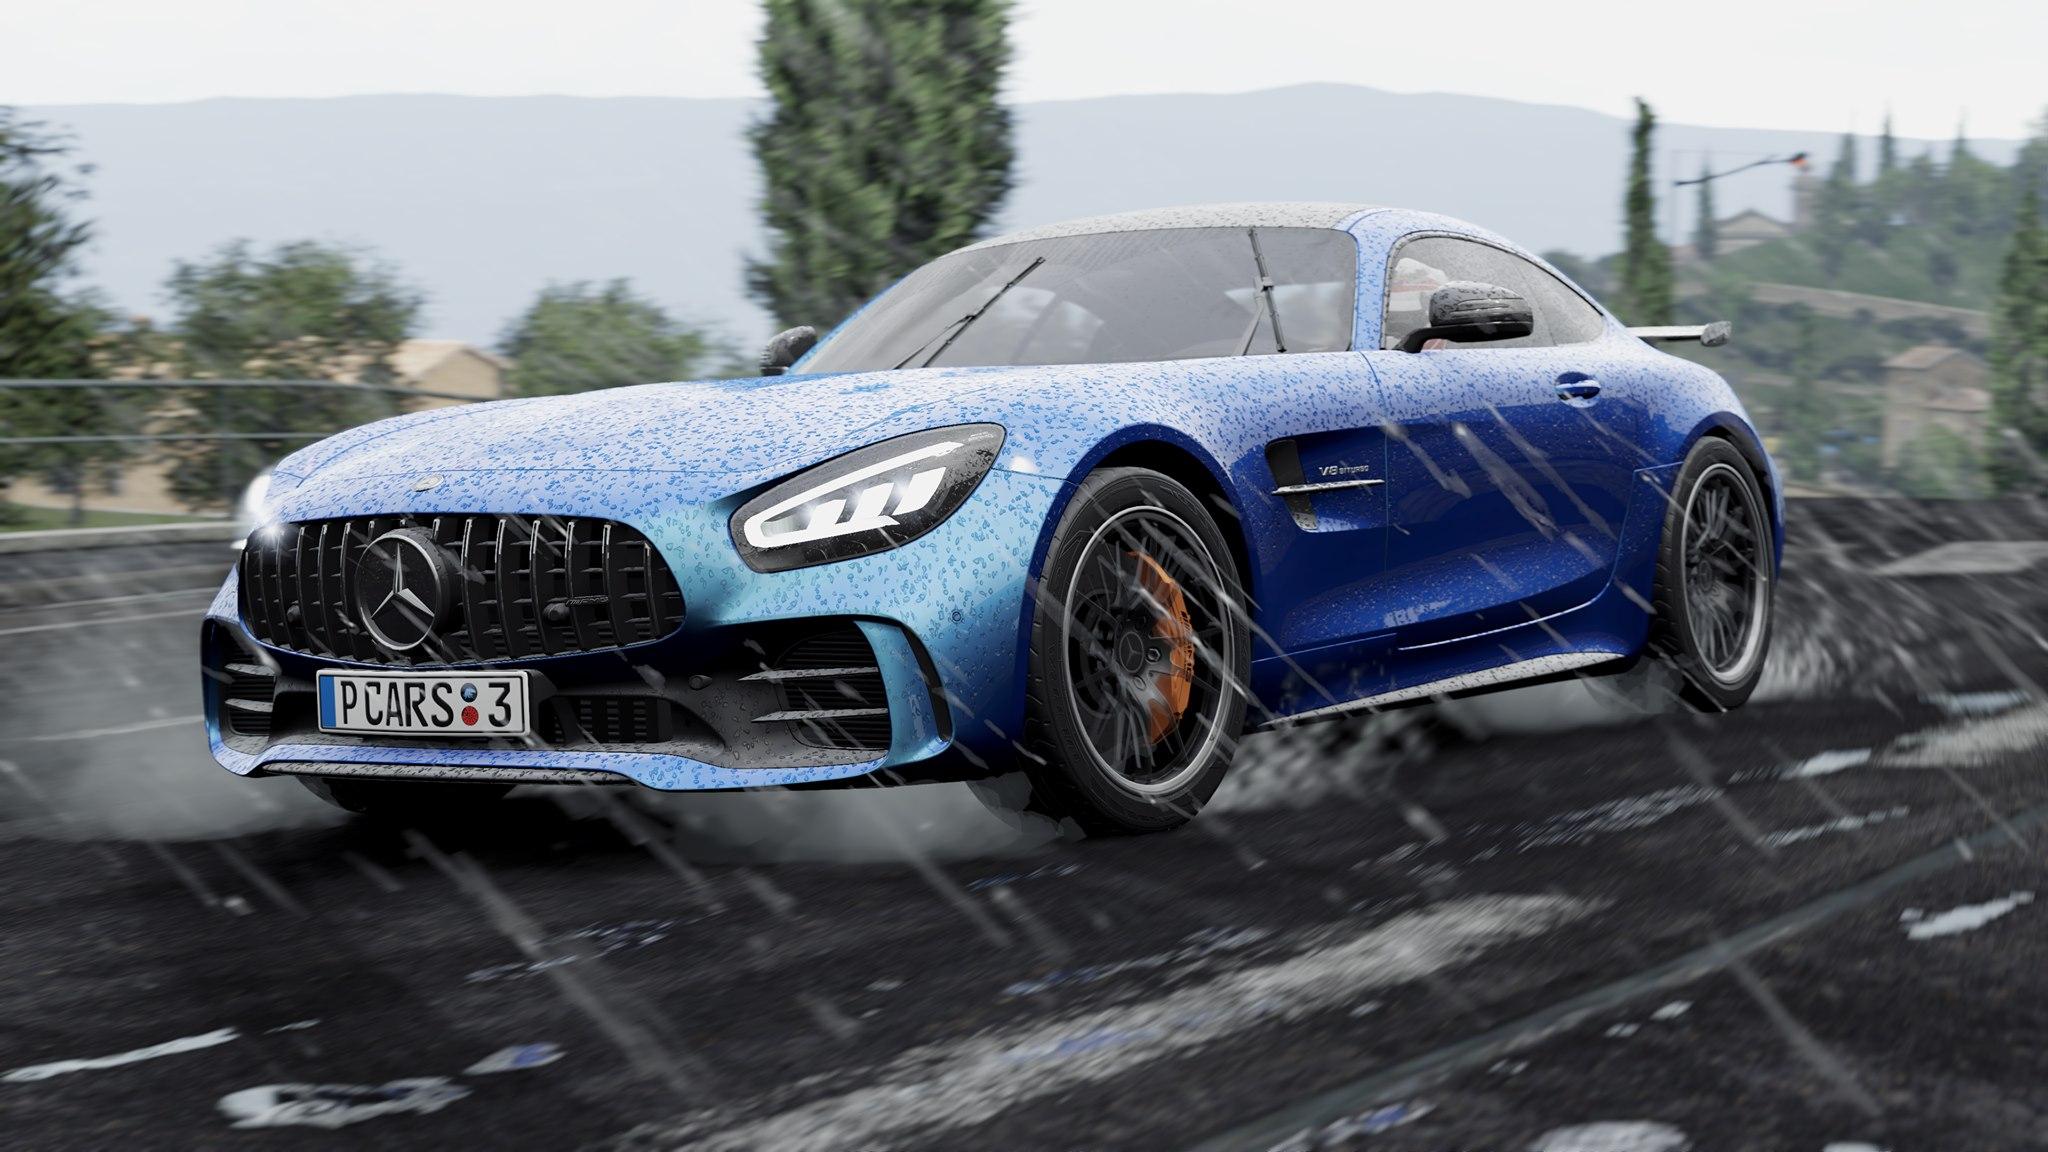 Project Cars 3 rain